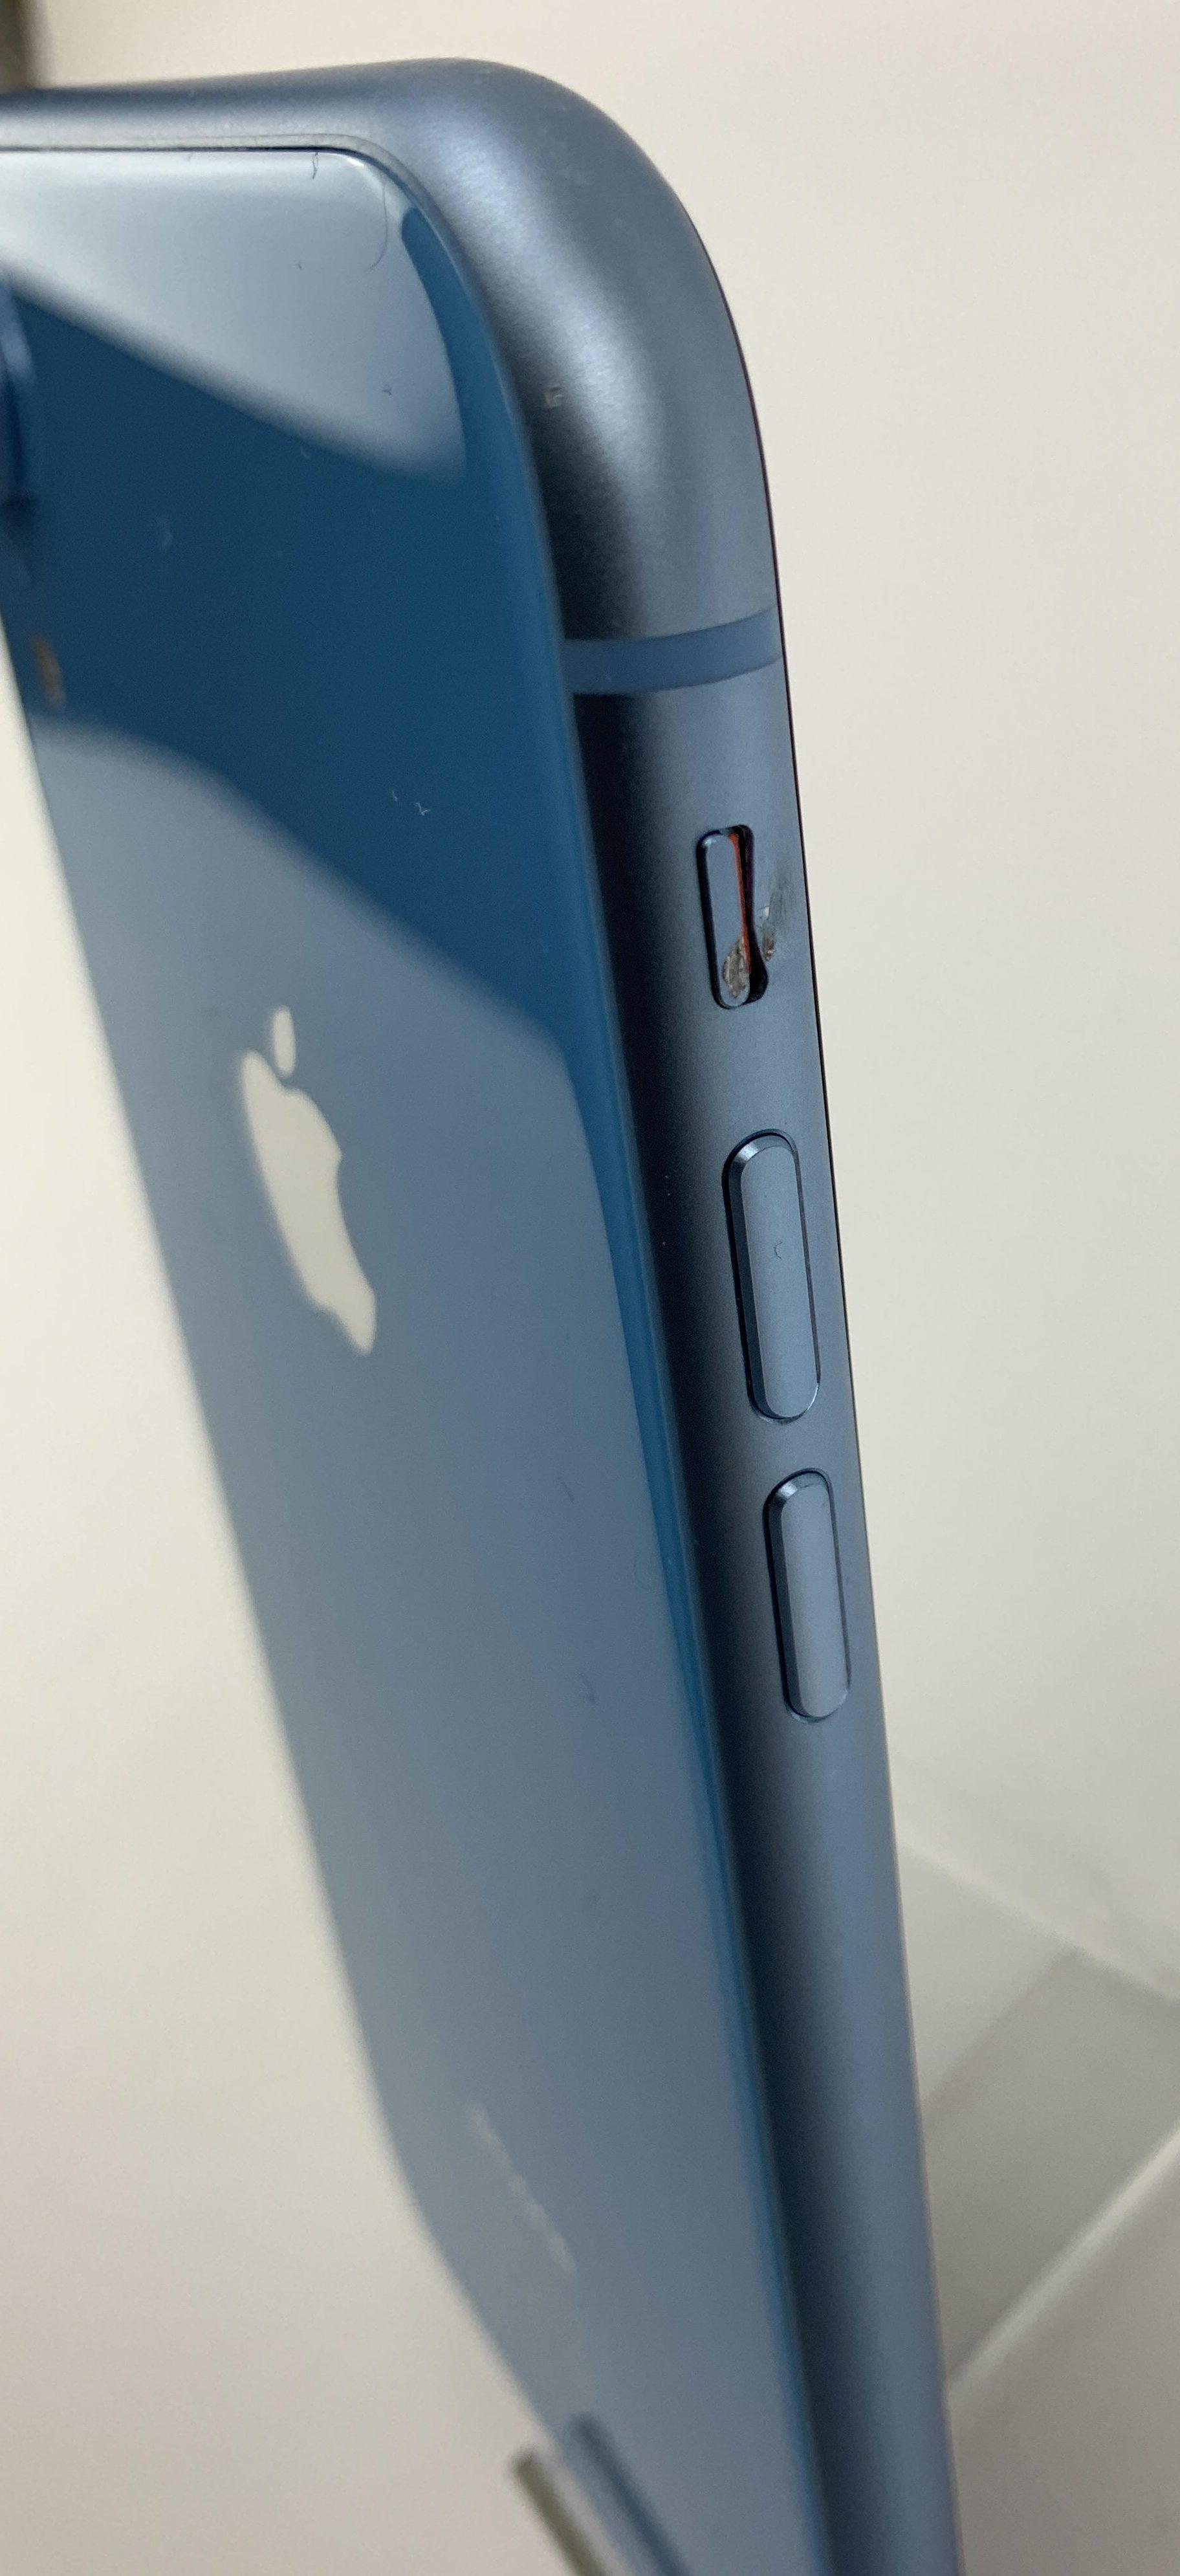 iPhone XR 64GB, 64GB, Blue, image 3